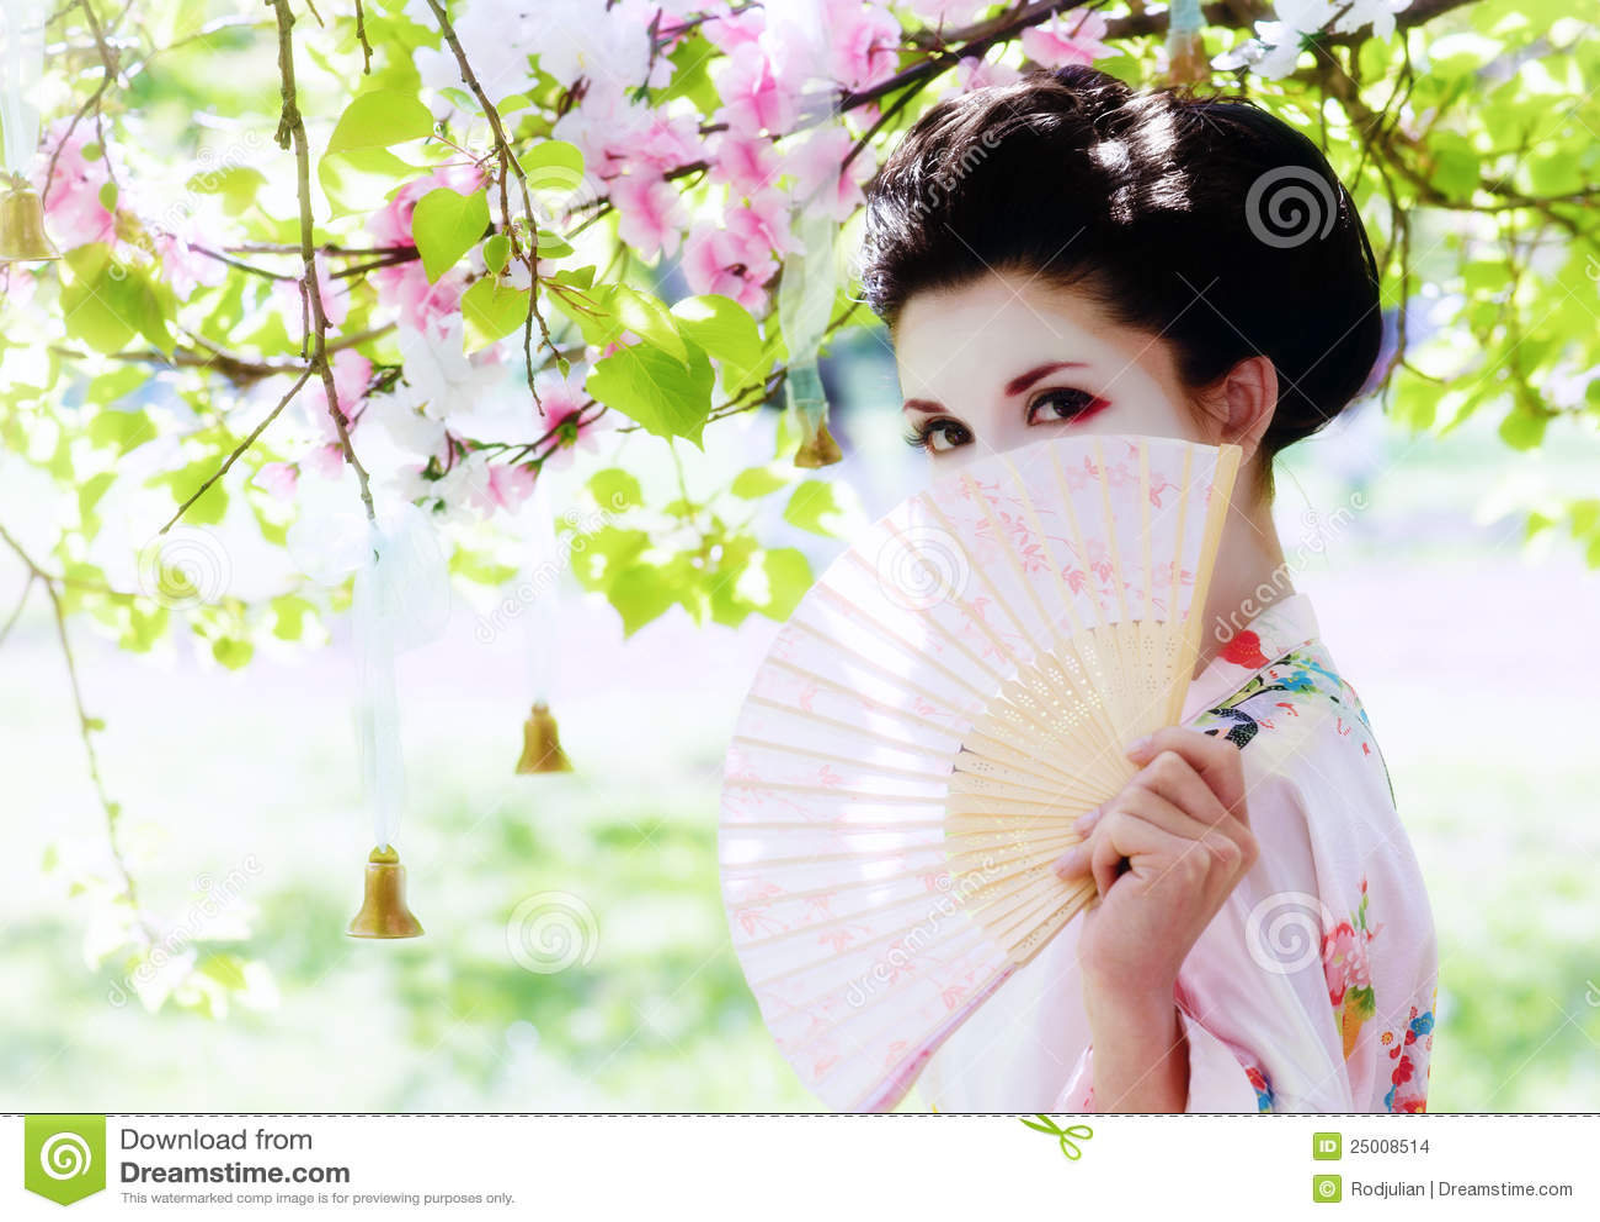 Geisha with fan in the garden